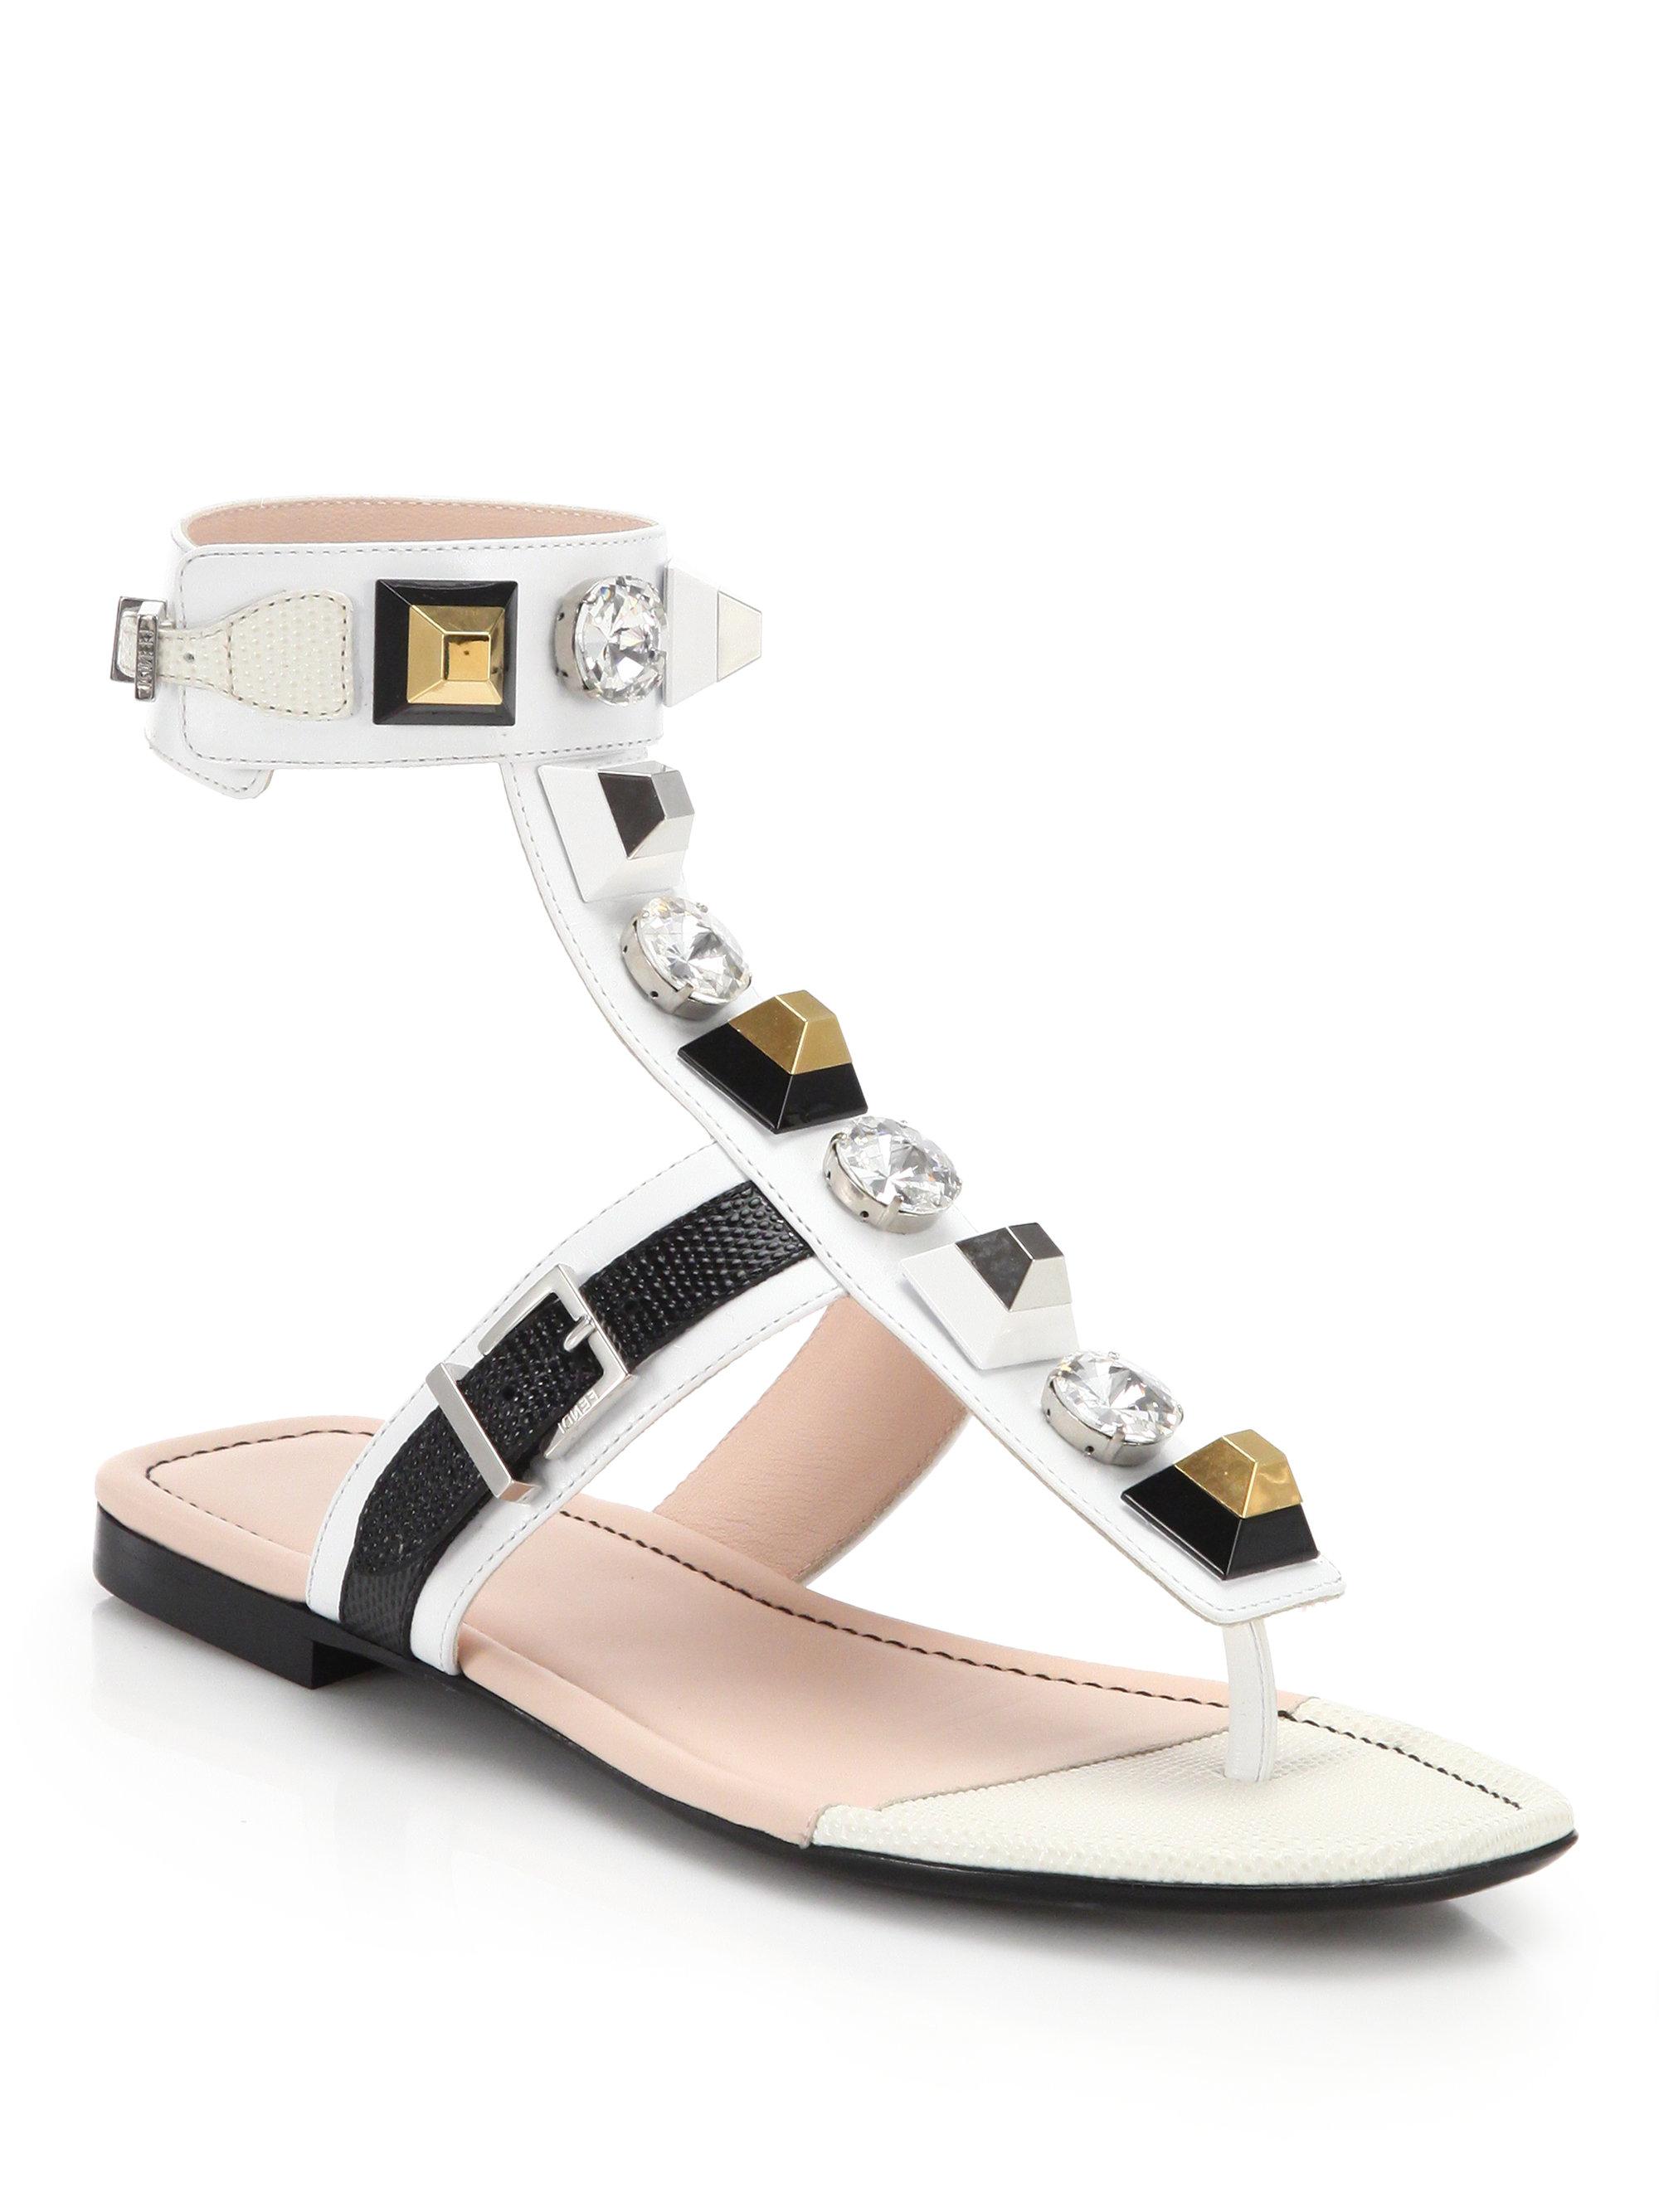 17198bf09900 Lyst - Fendi Embellished Leather Sandals